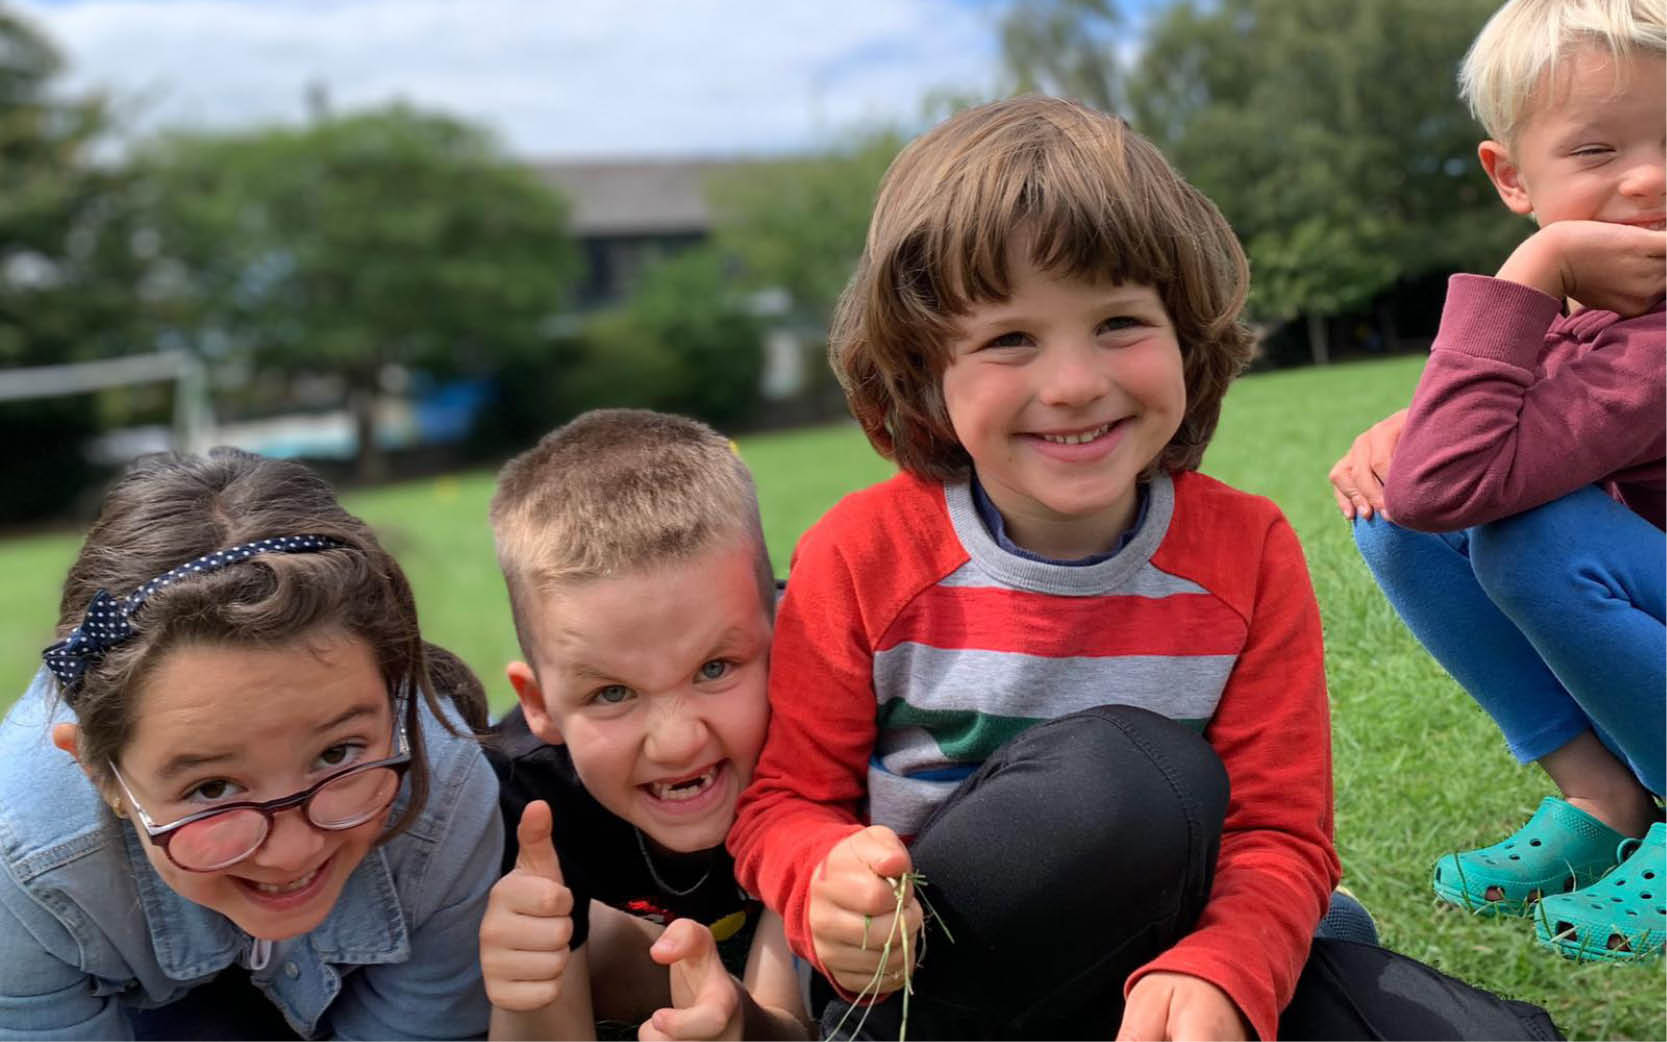 Parachute games at Bristol primary school sports club